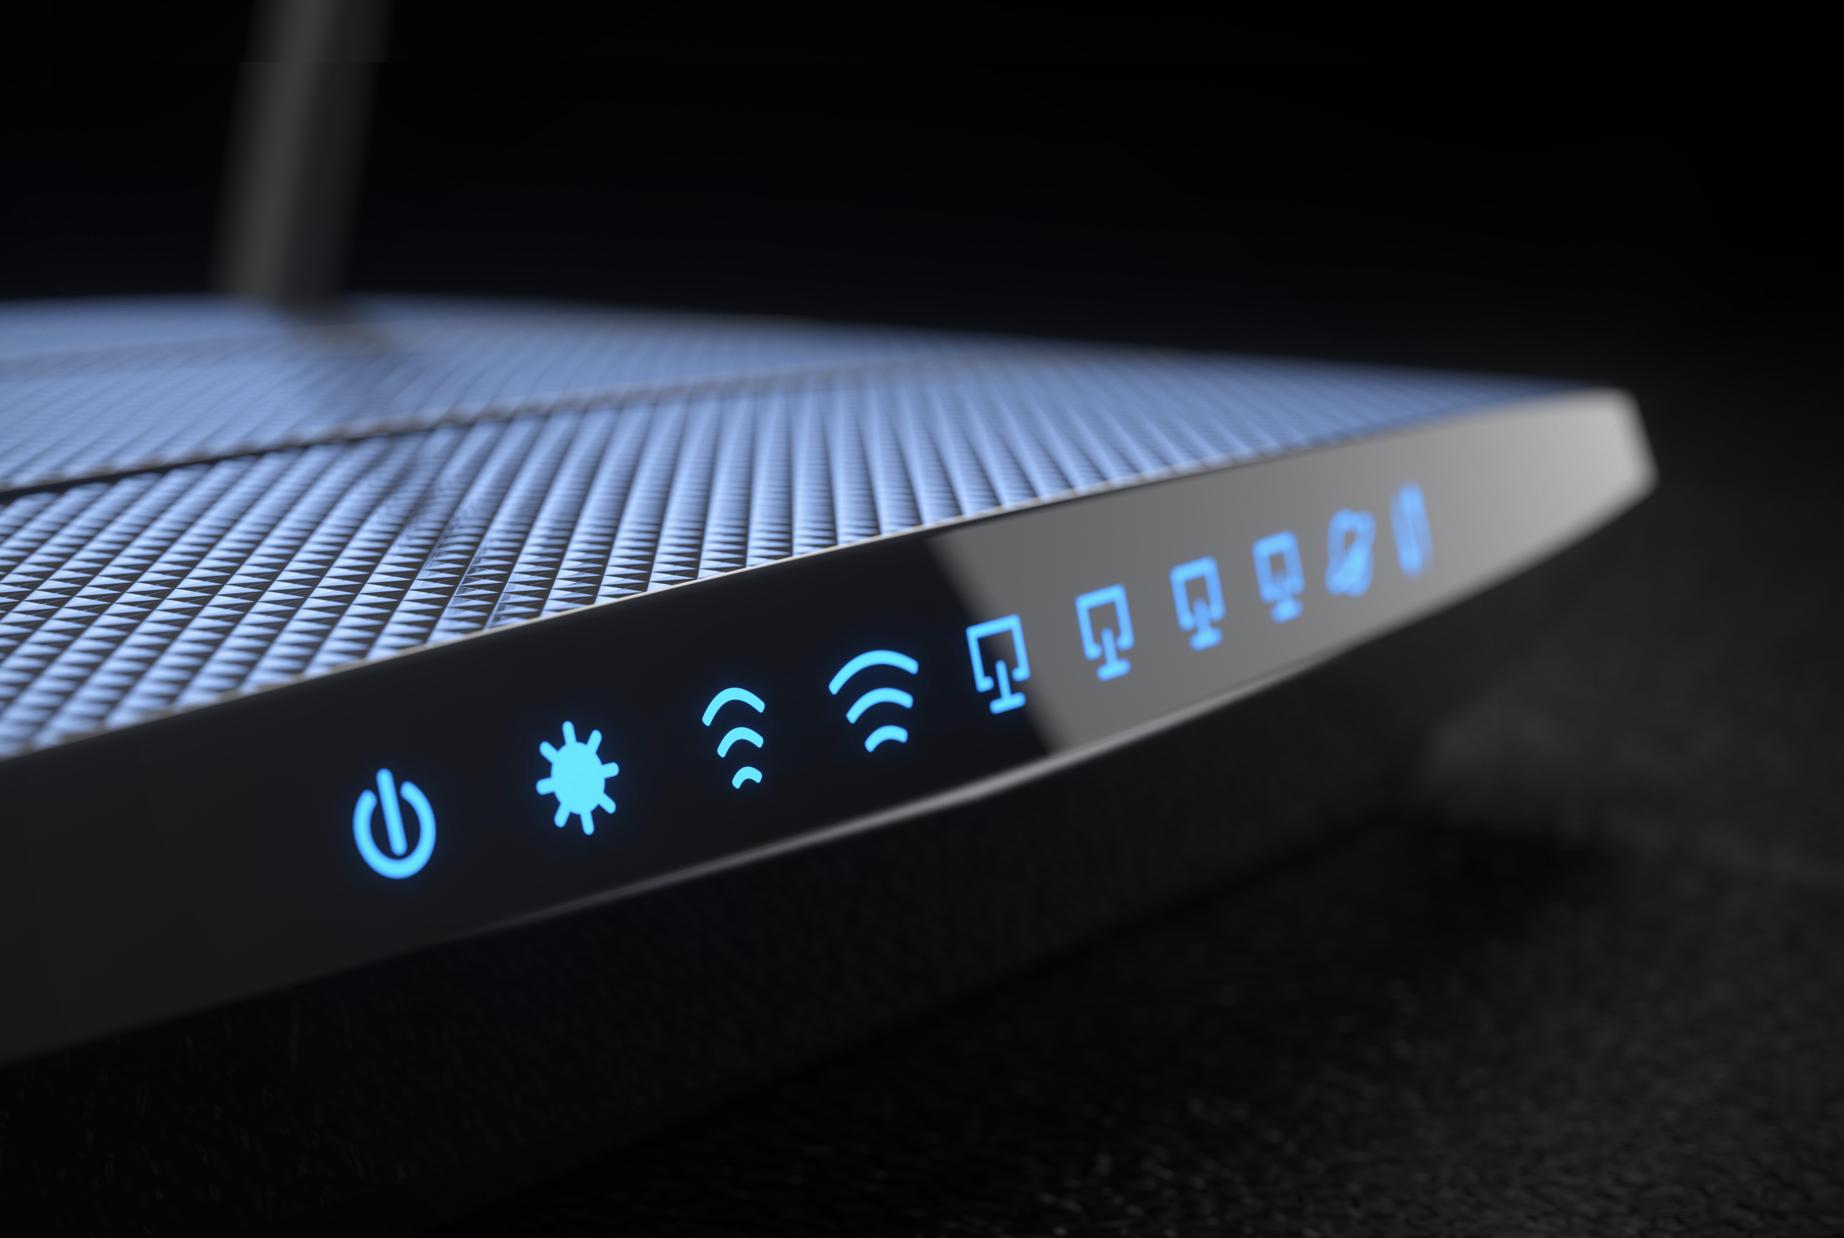 Giao thức Wifi